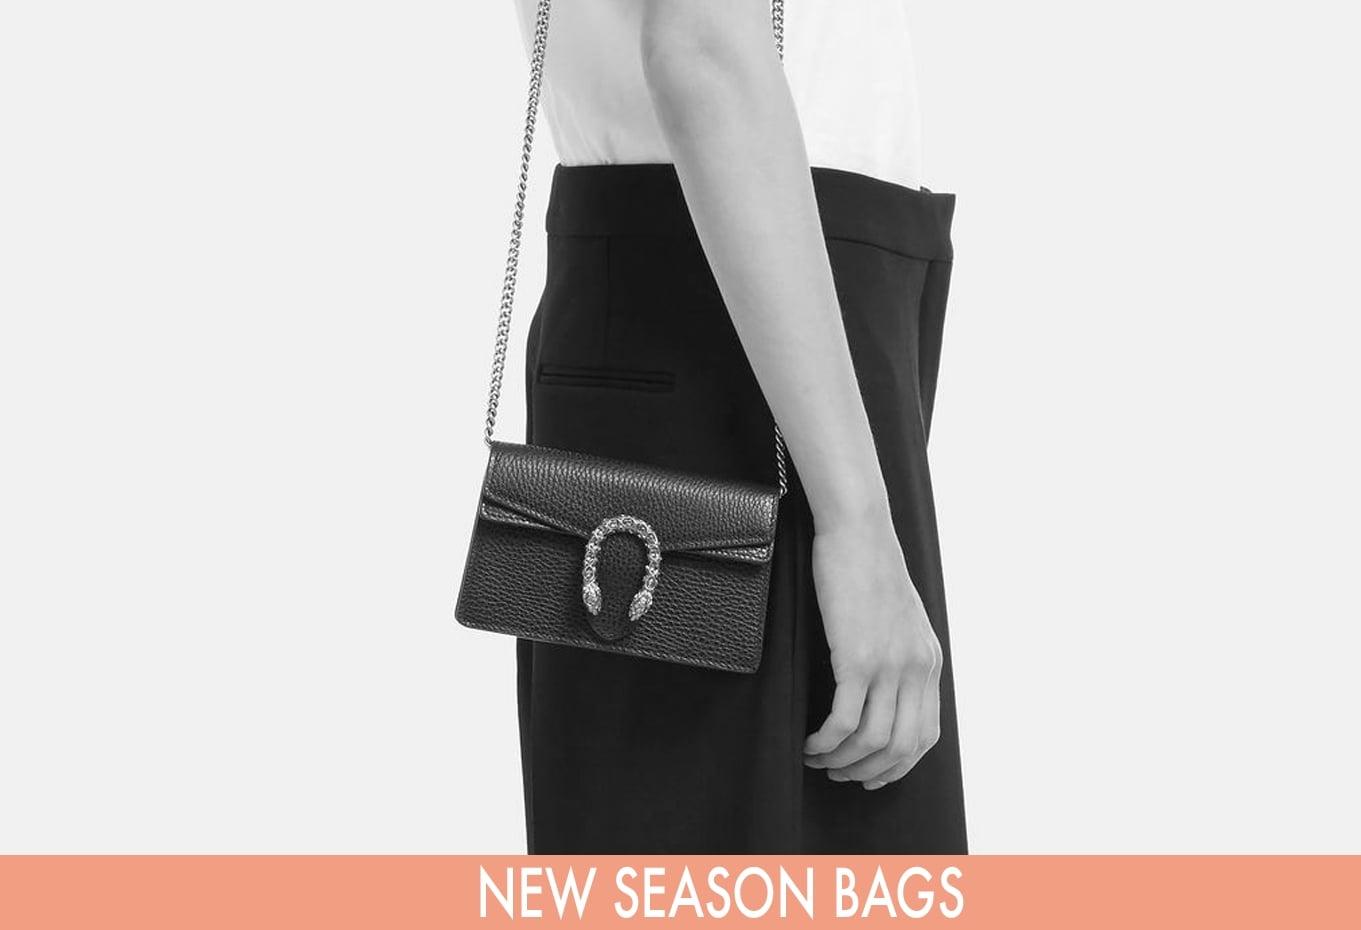 New season bags